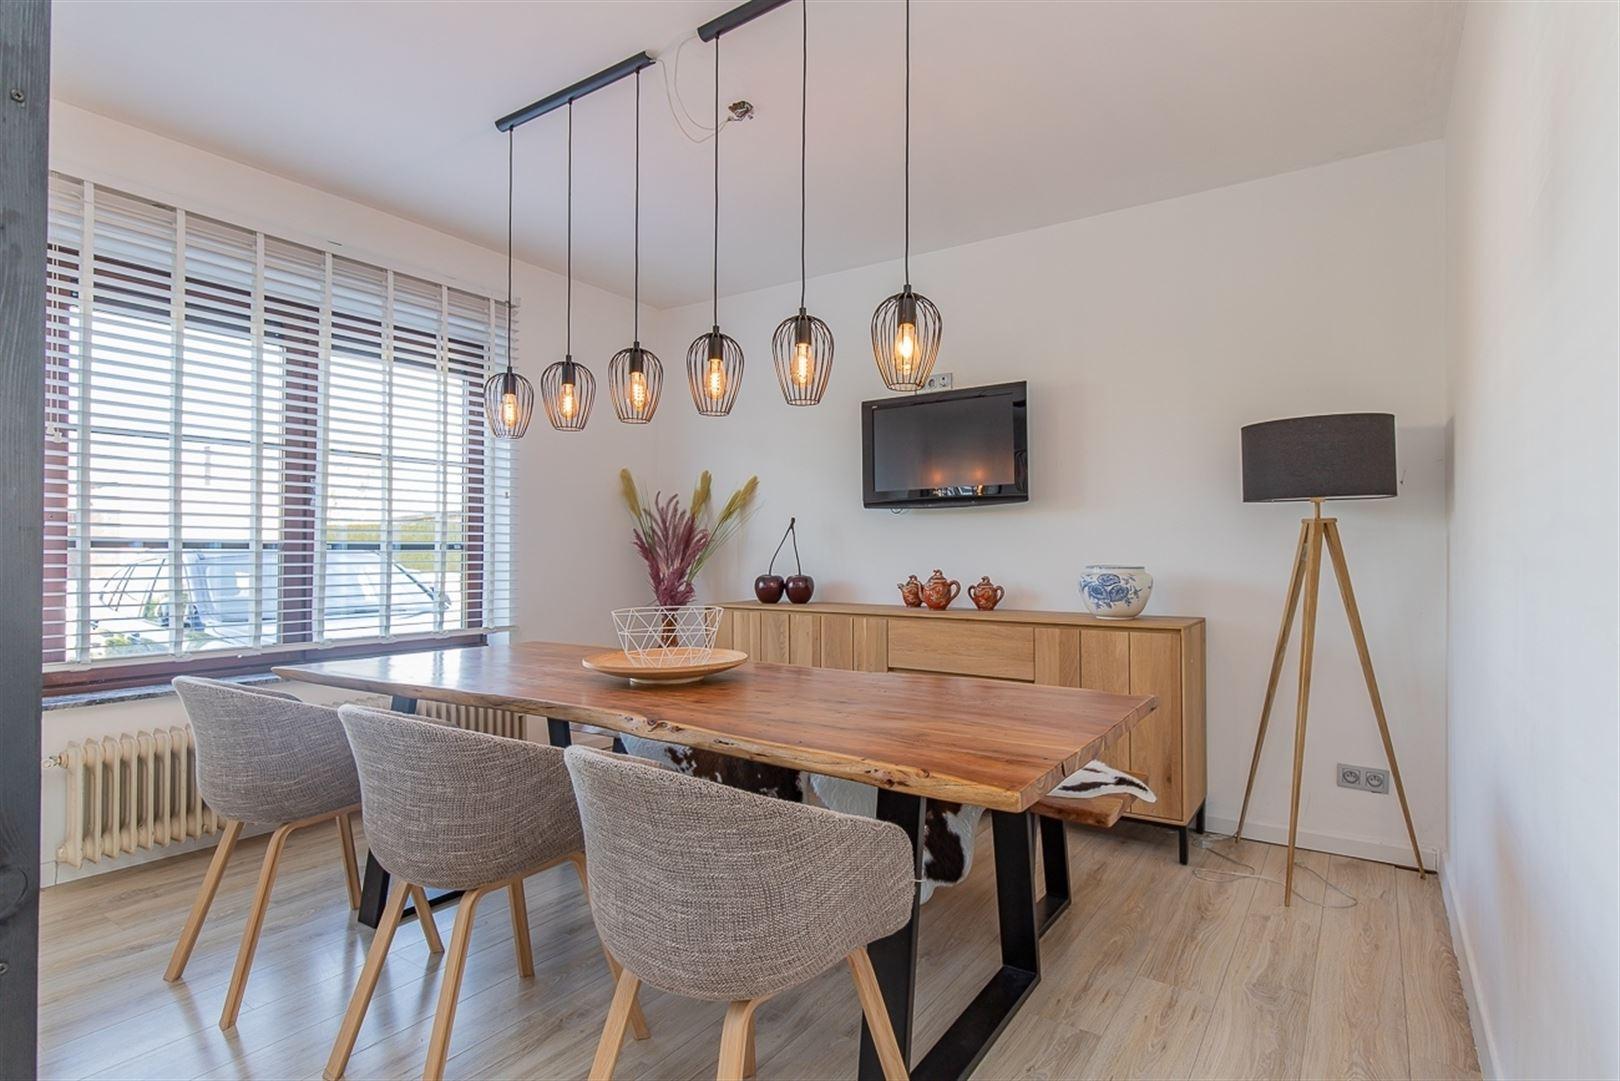 Foto 5 : Villa te 9100 SINT-NIKLAAS (België) - Prijs € 549.000